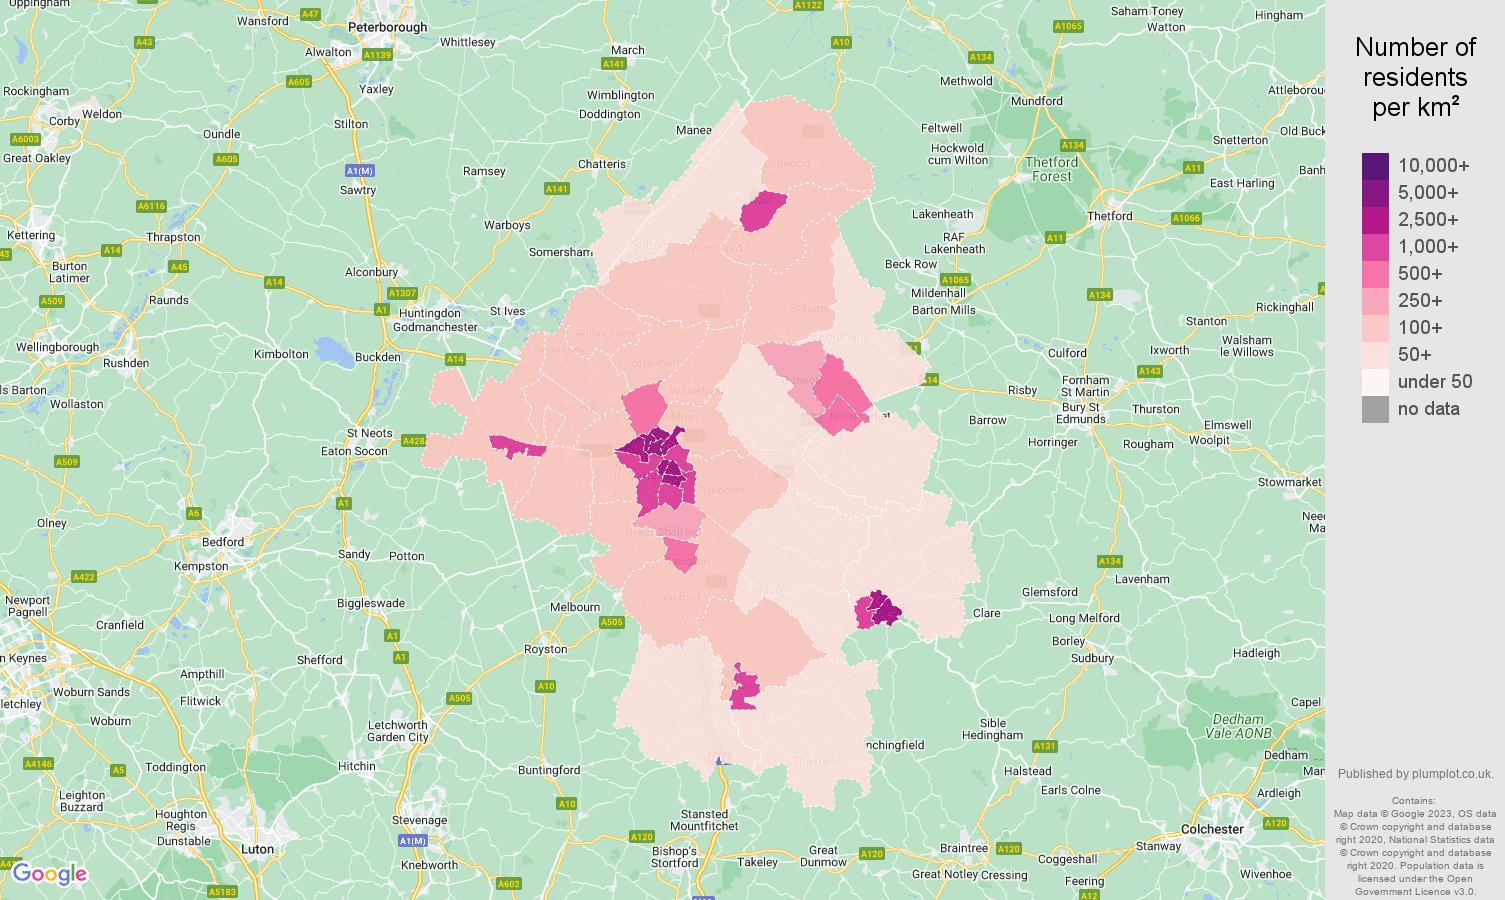 Cambridge population density map